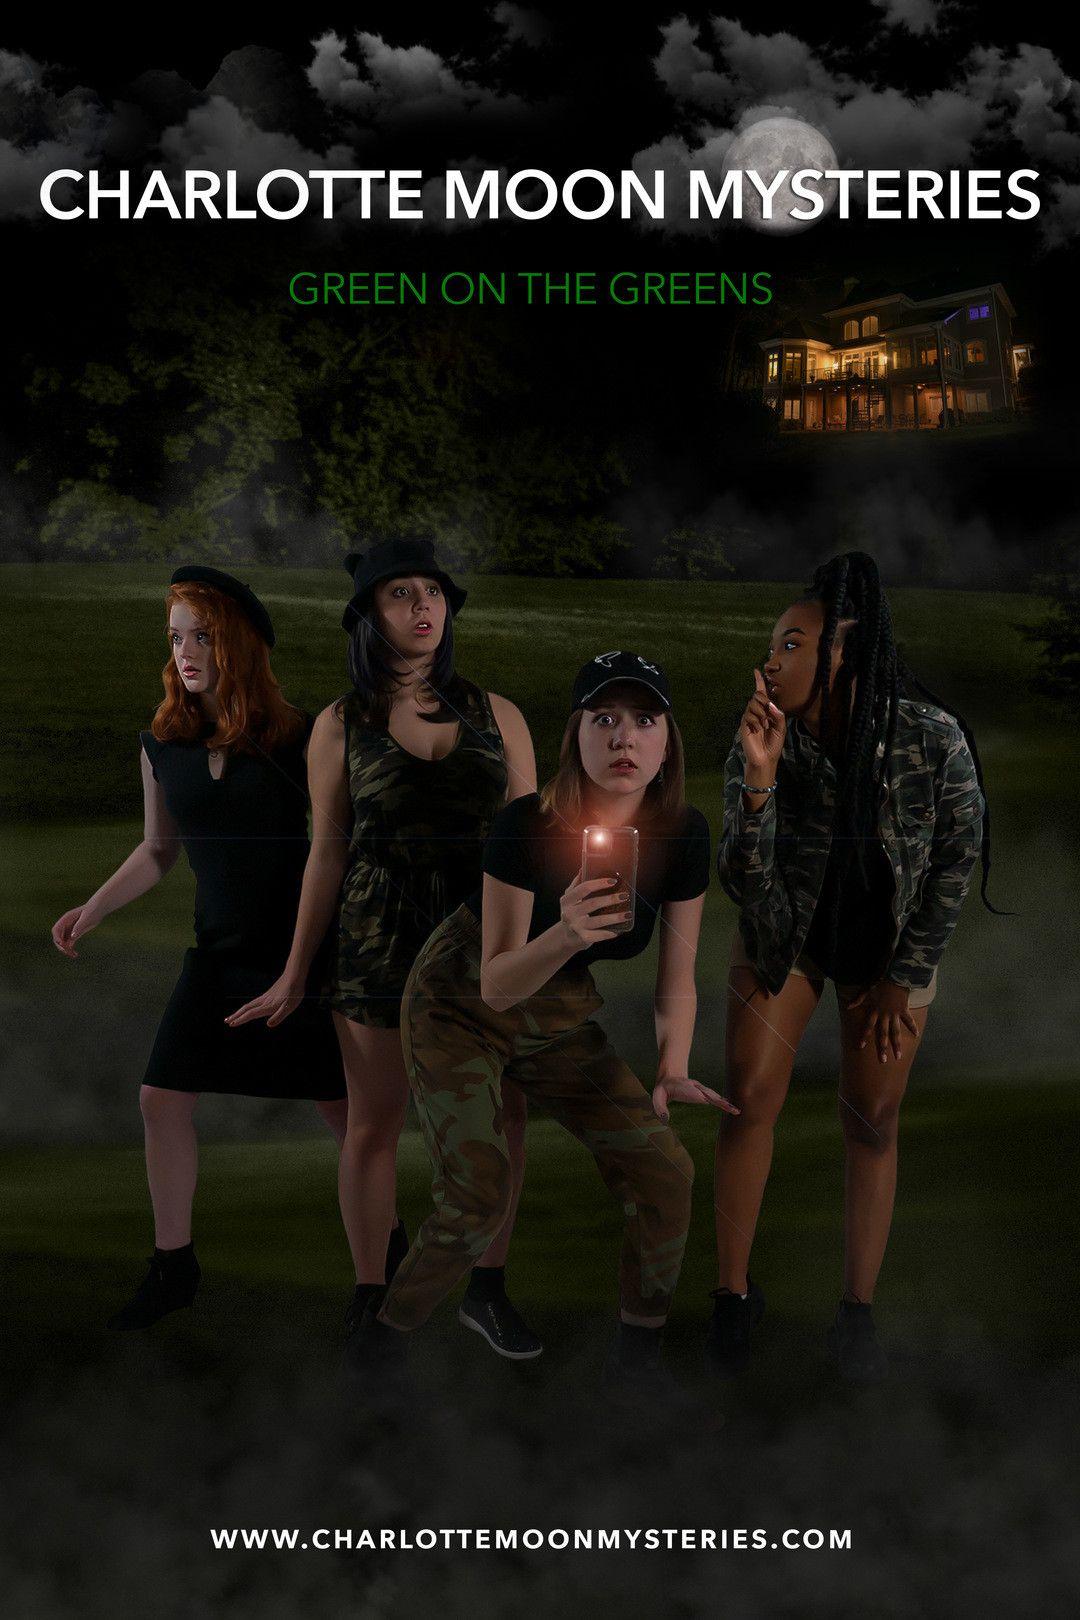 Шарлотта Мун: Убийство на лужайке / Charlotte Moon Mysteries - Green on the Greens / 2021